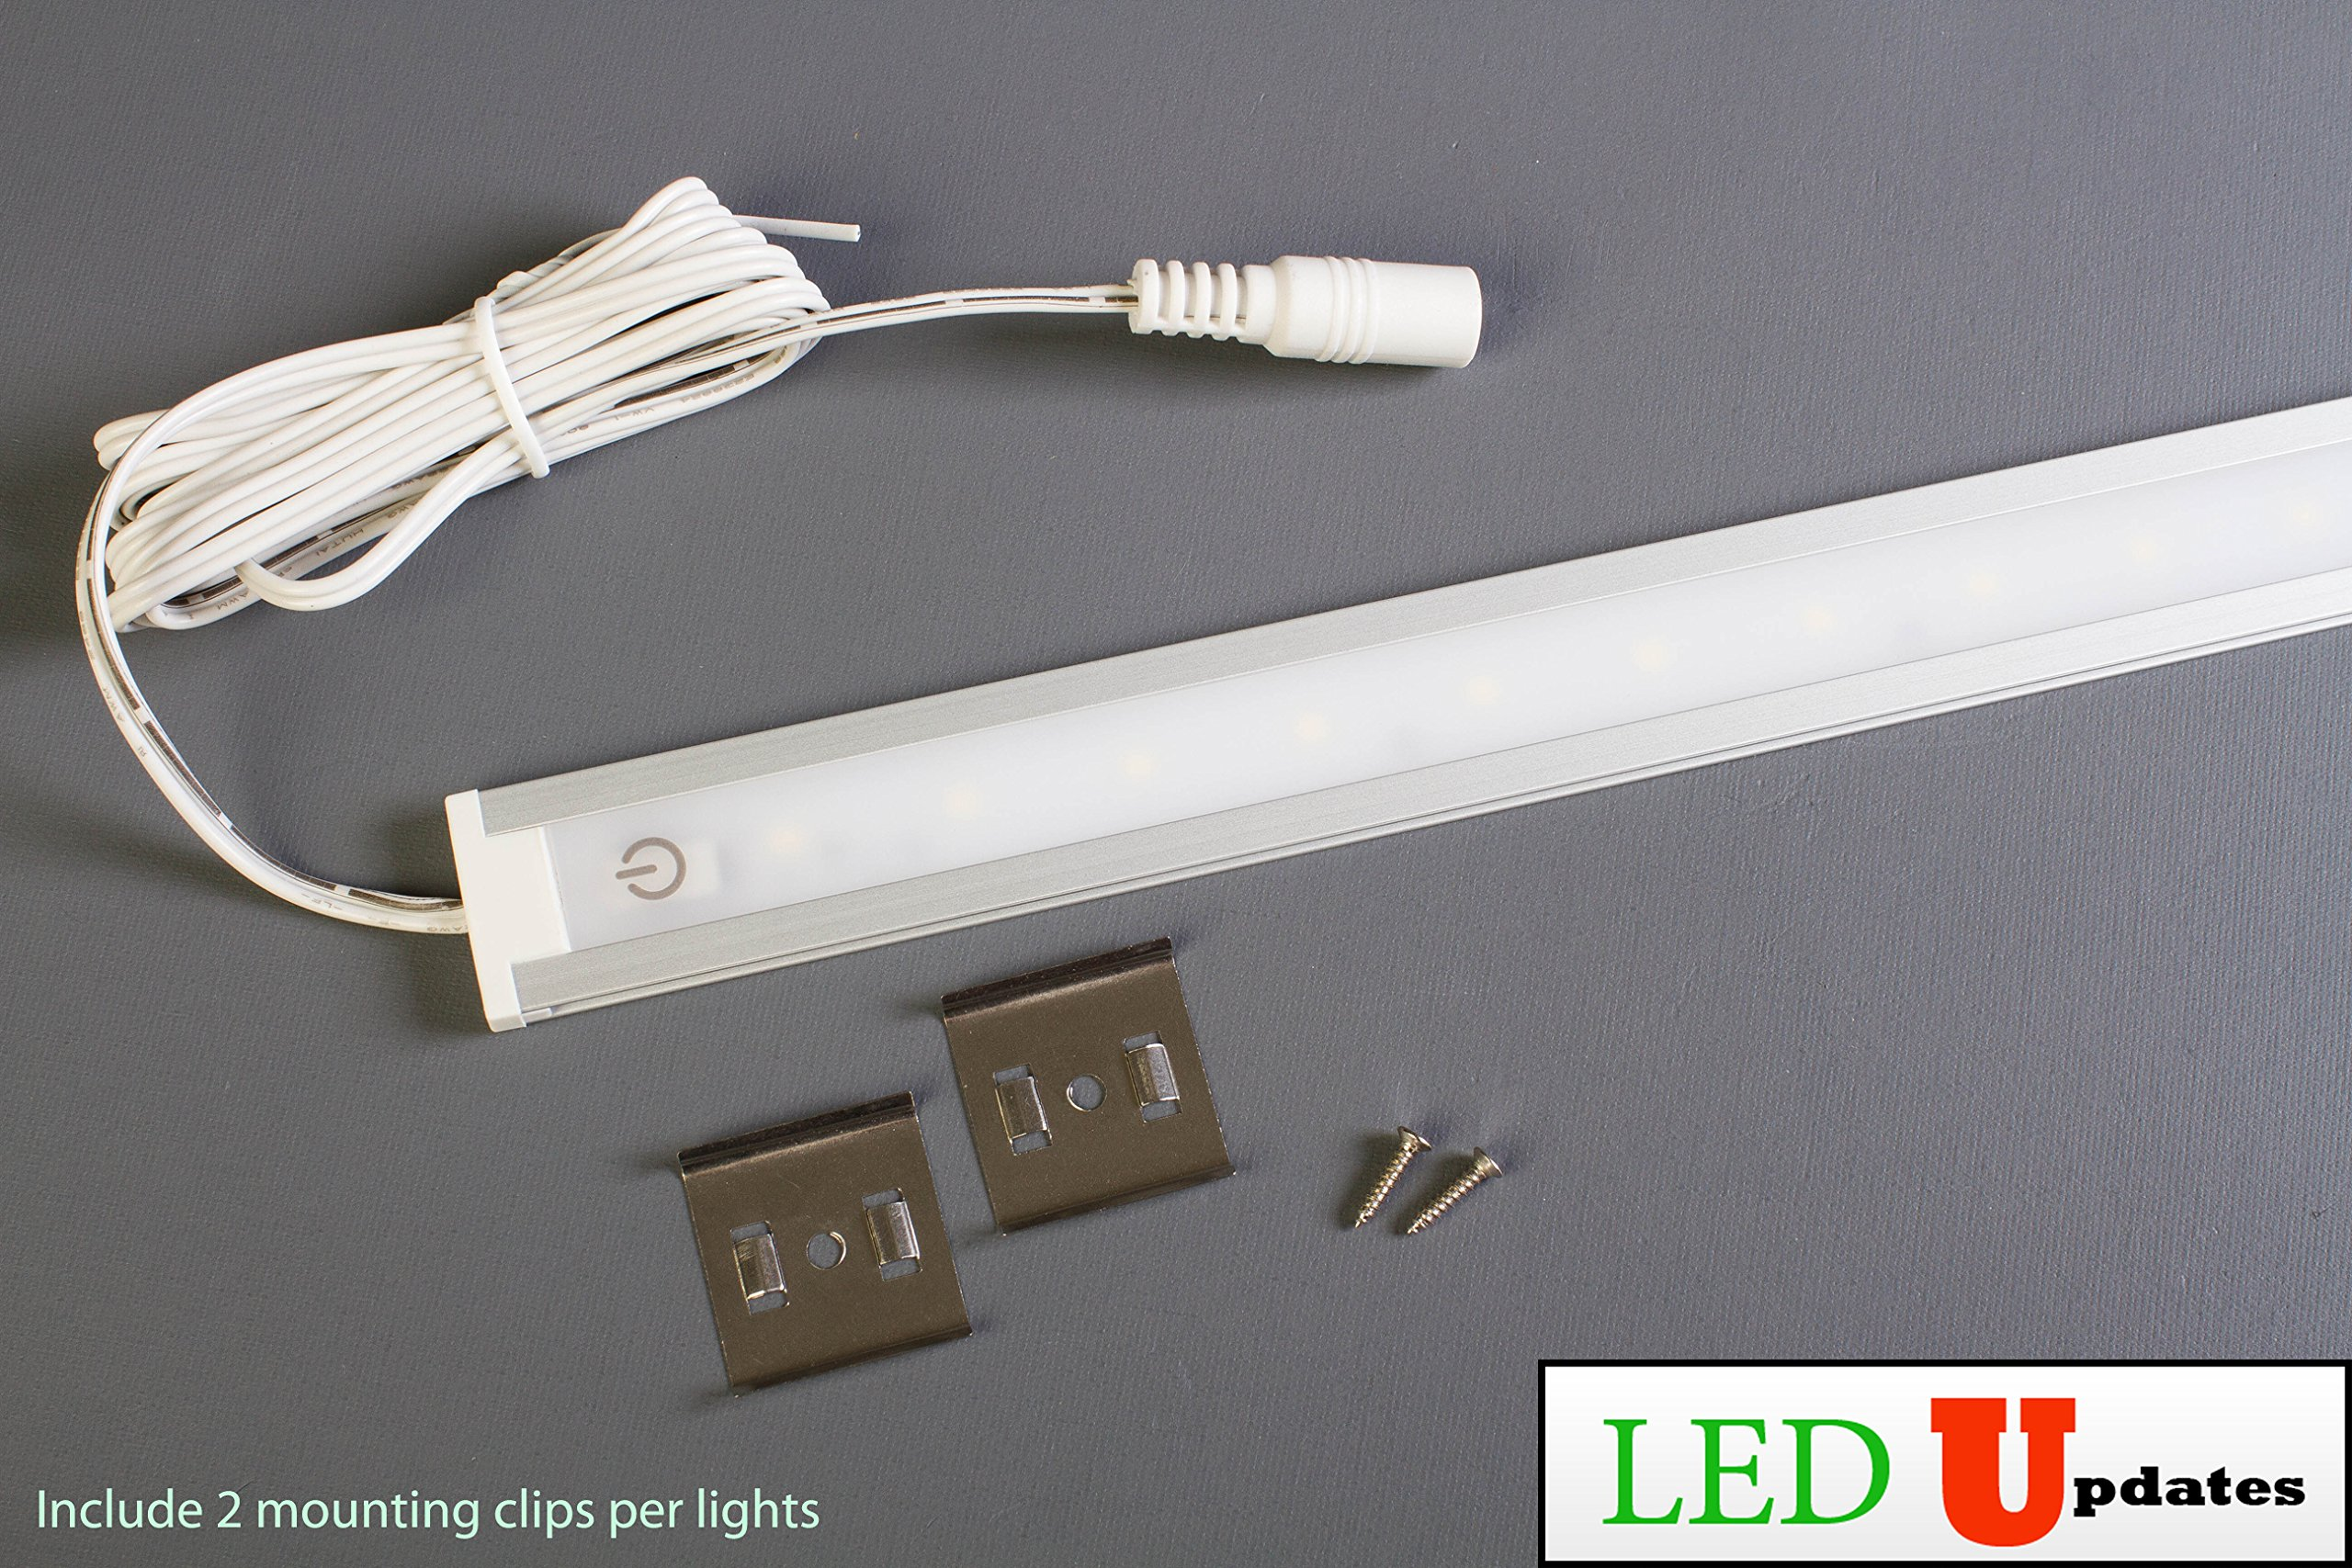 LEDupdates 24 inches Under Cabinet LED light for work shop & closet with UL Power adapter by LEDUPDATES (Image #3)